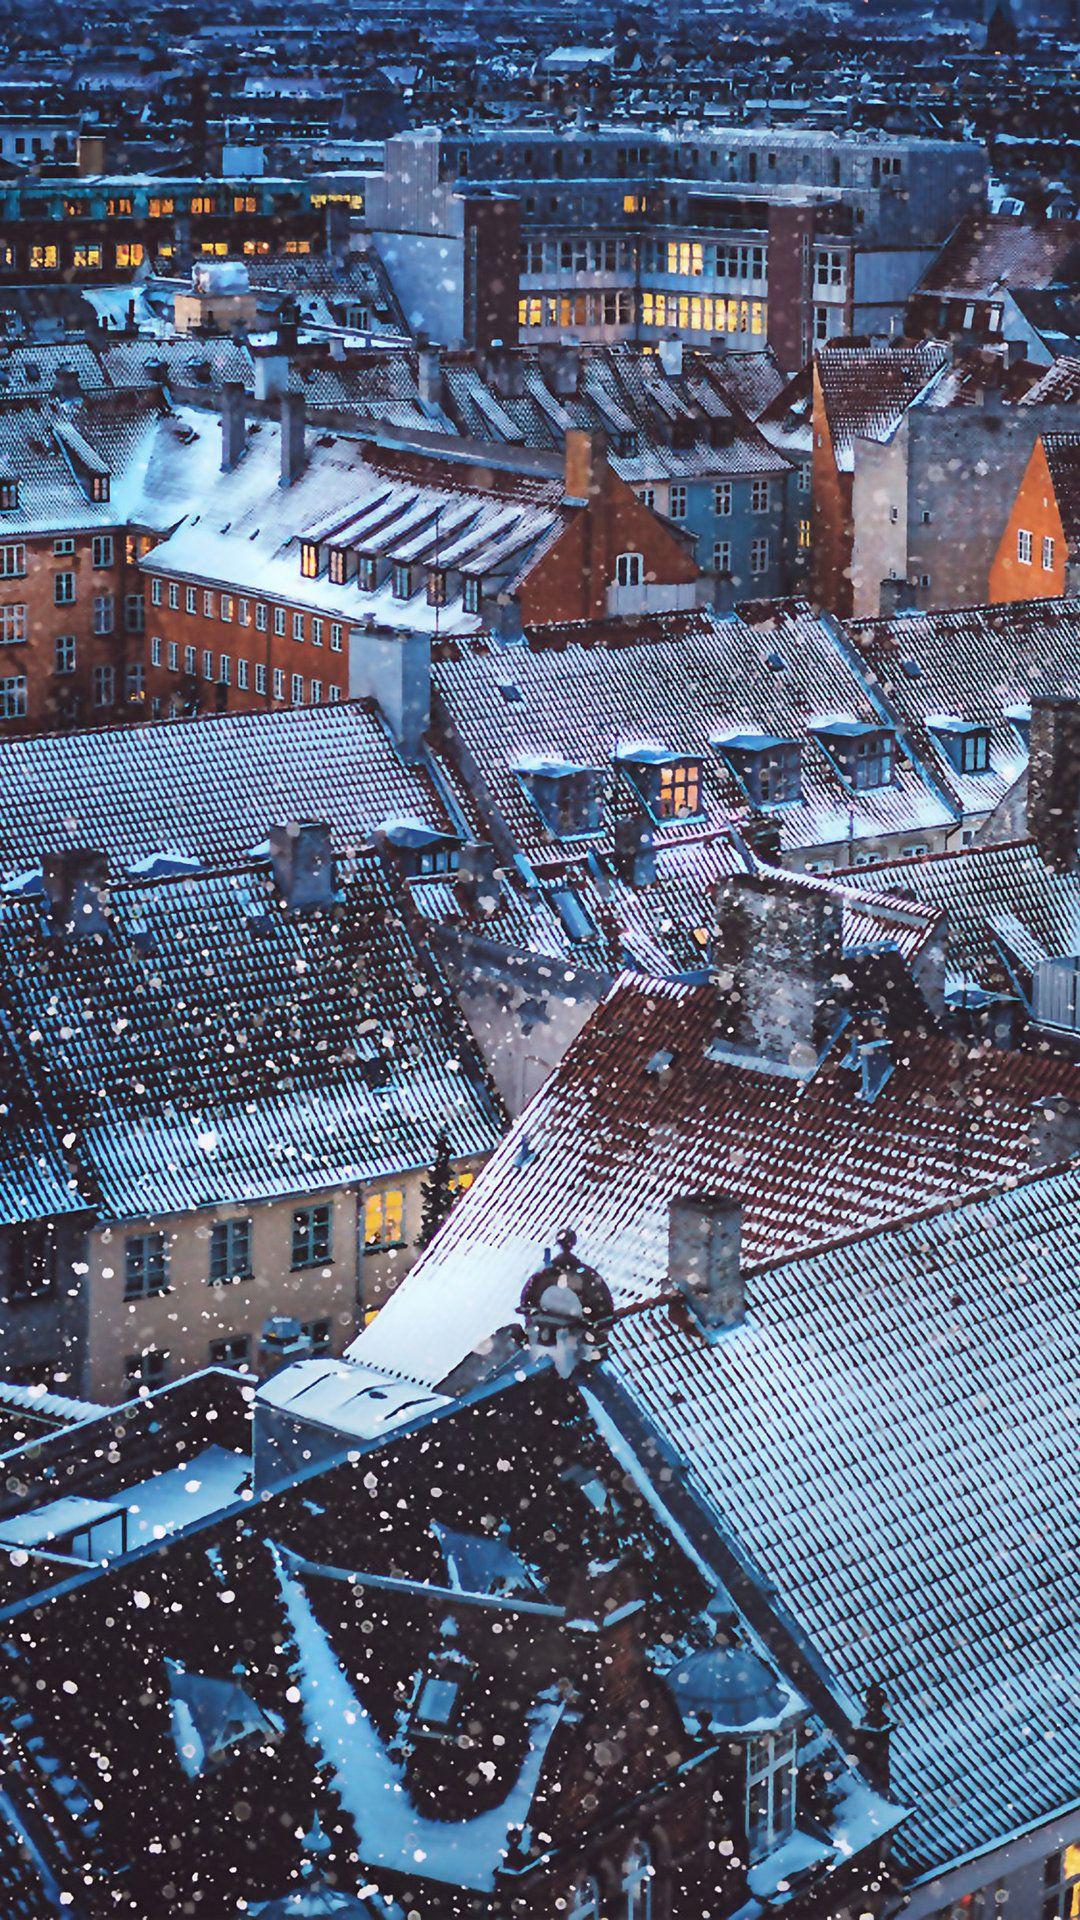 Pin By Tebs W On Christmas Eve Winter Scenes Scenery Winter Wonder